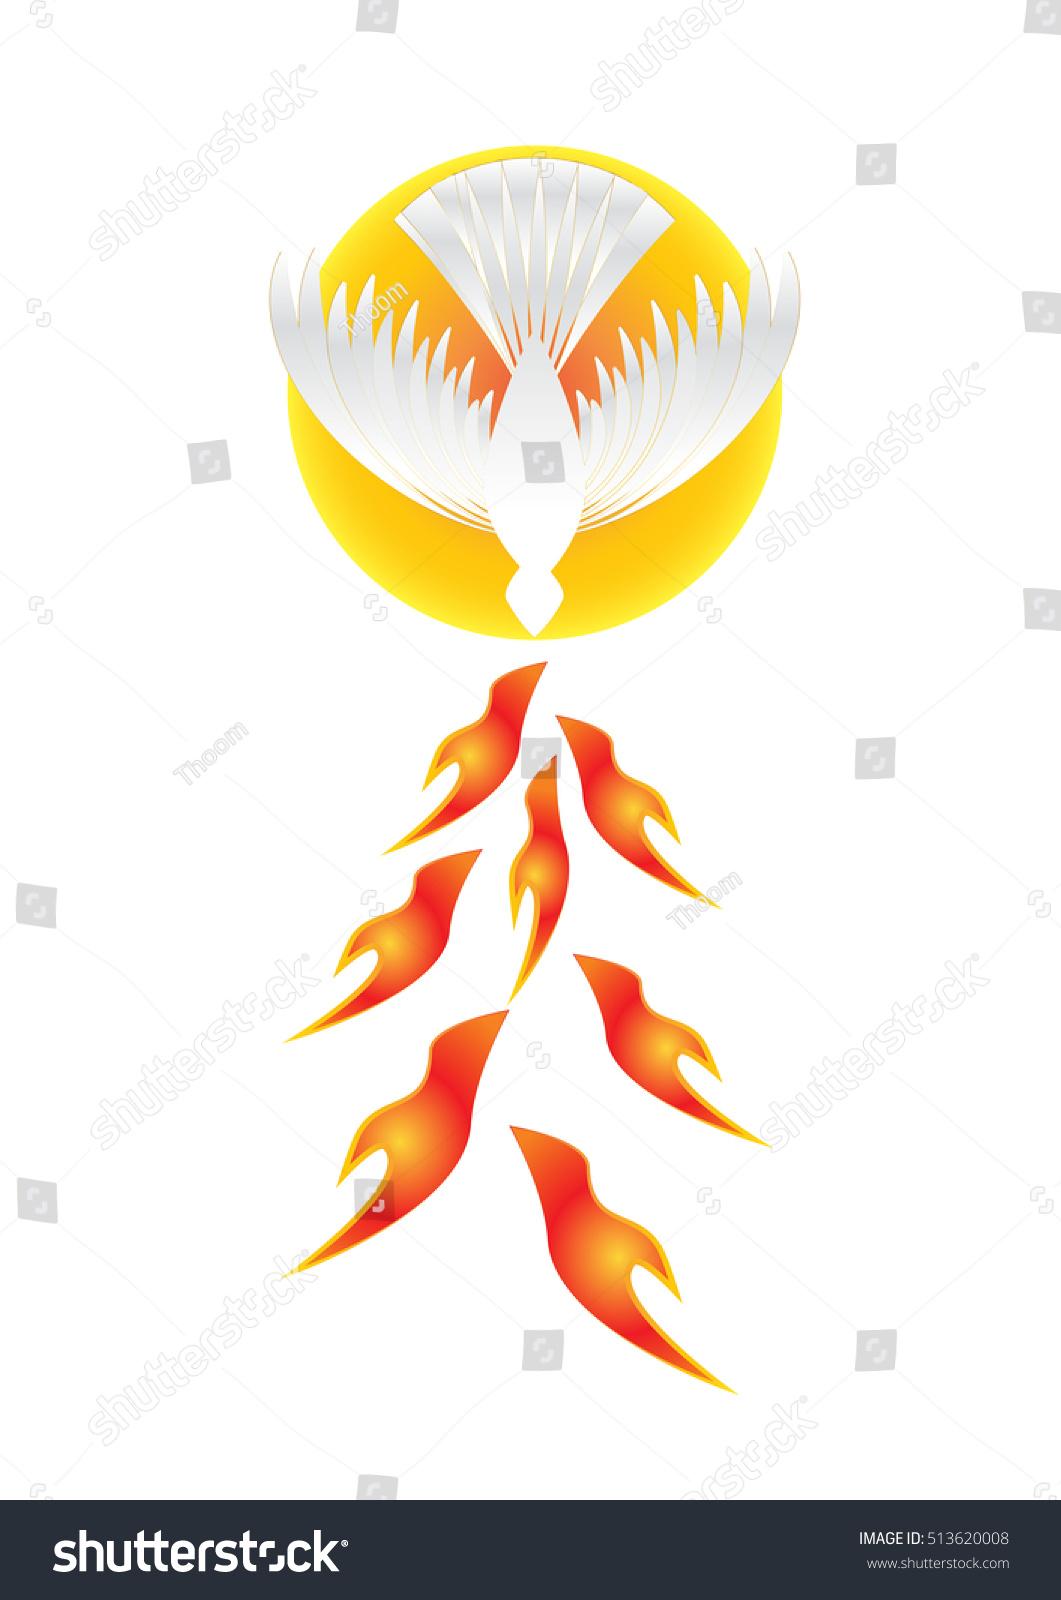 Holy spirit symbol white dove halo stock vector 513620008 holy spirit symbol a white dove with halo of light rays and seven rays biocorpaavc